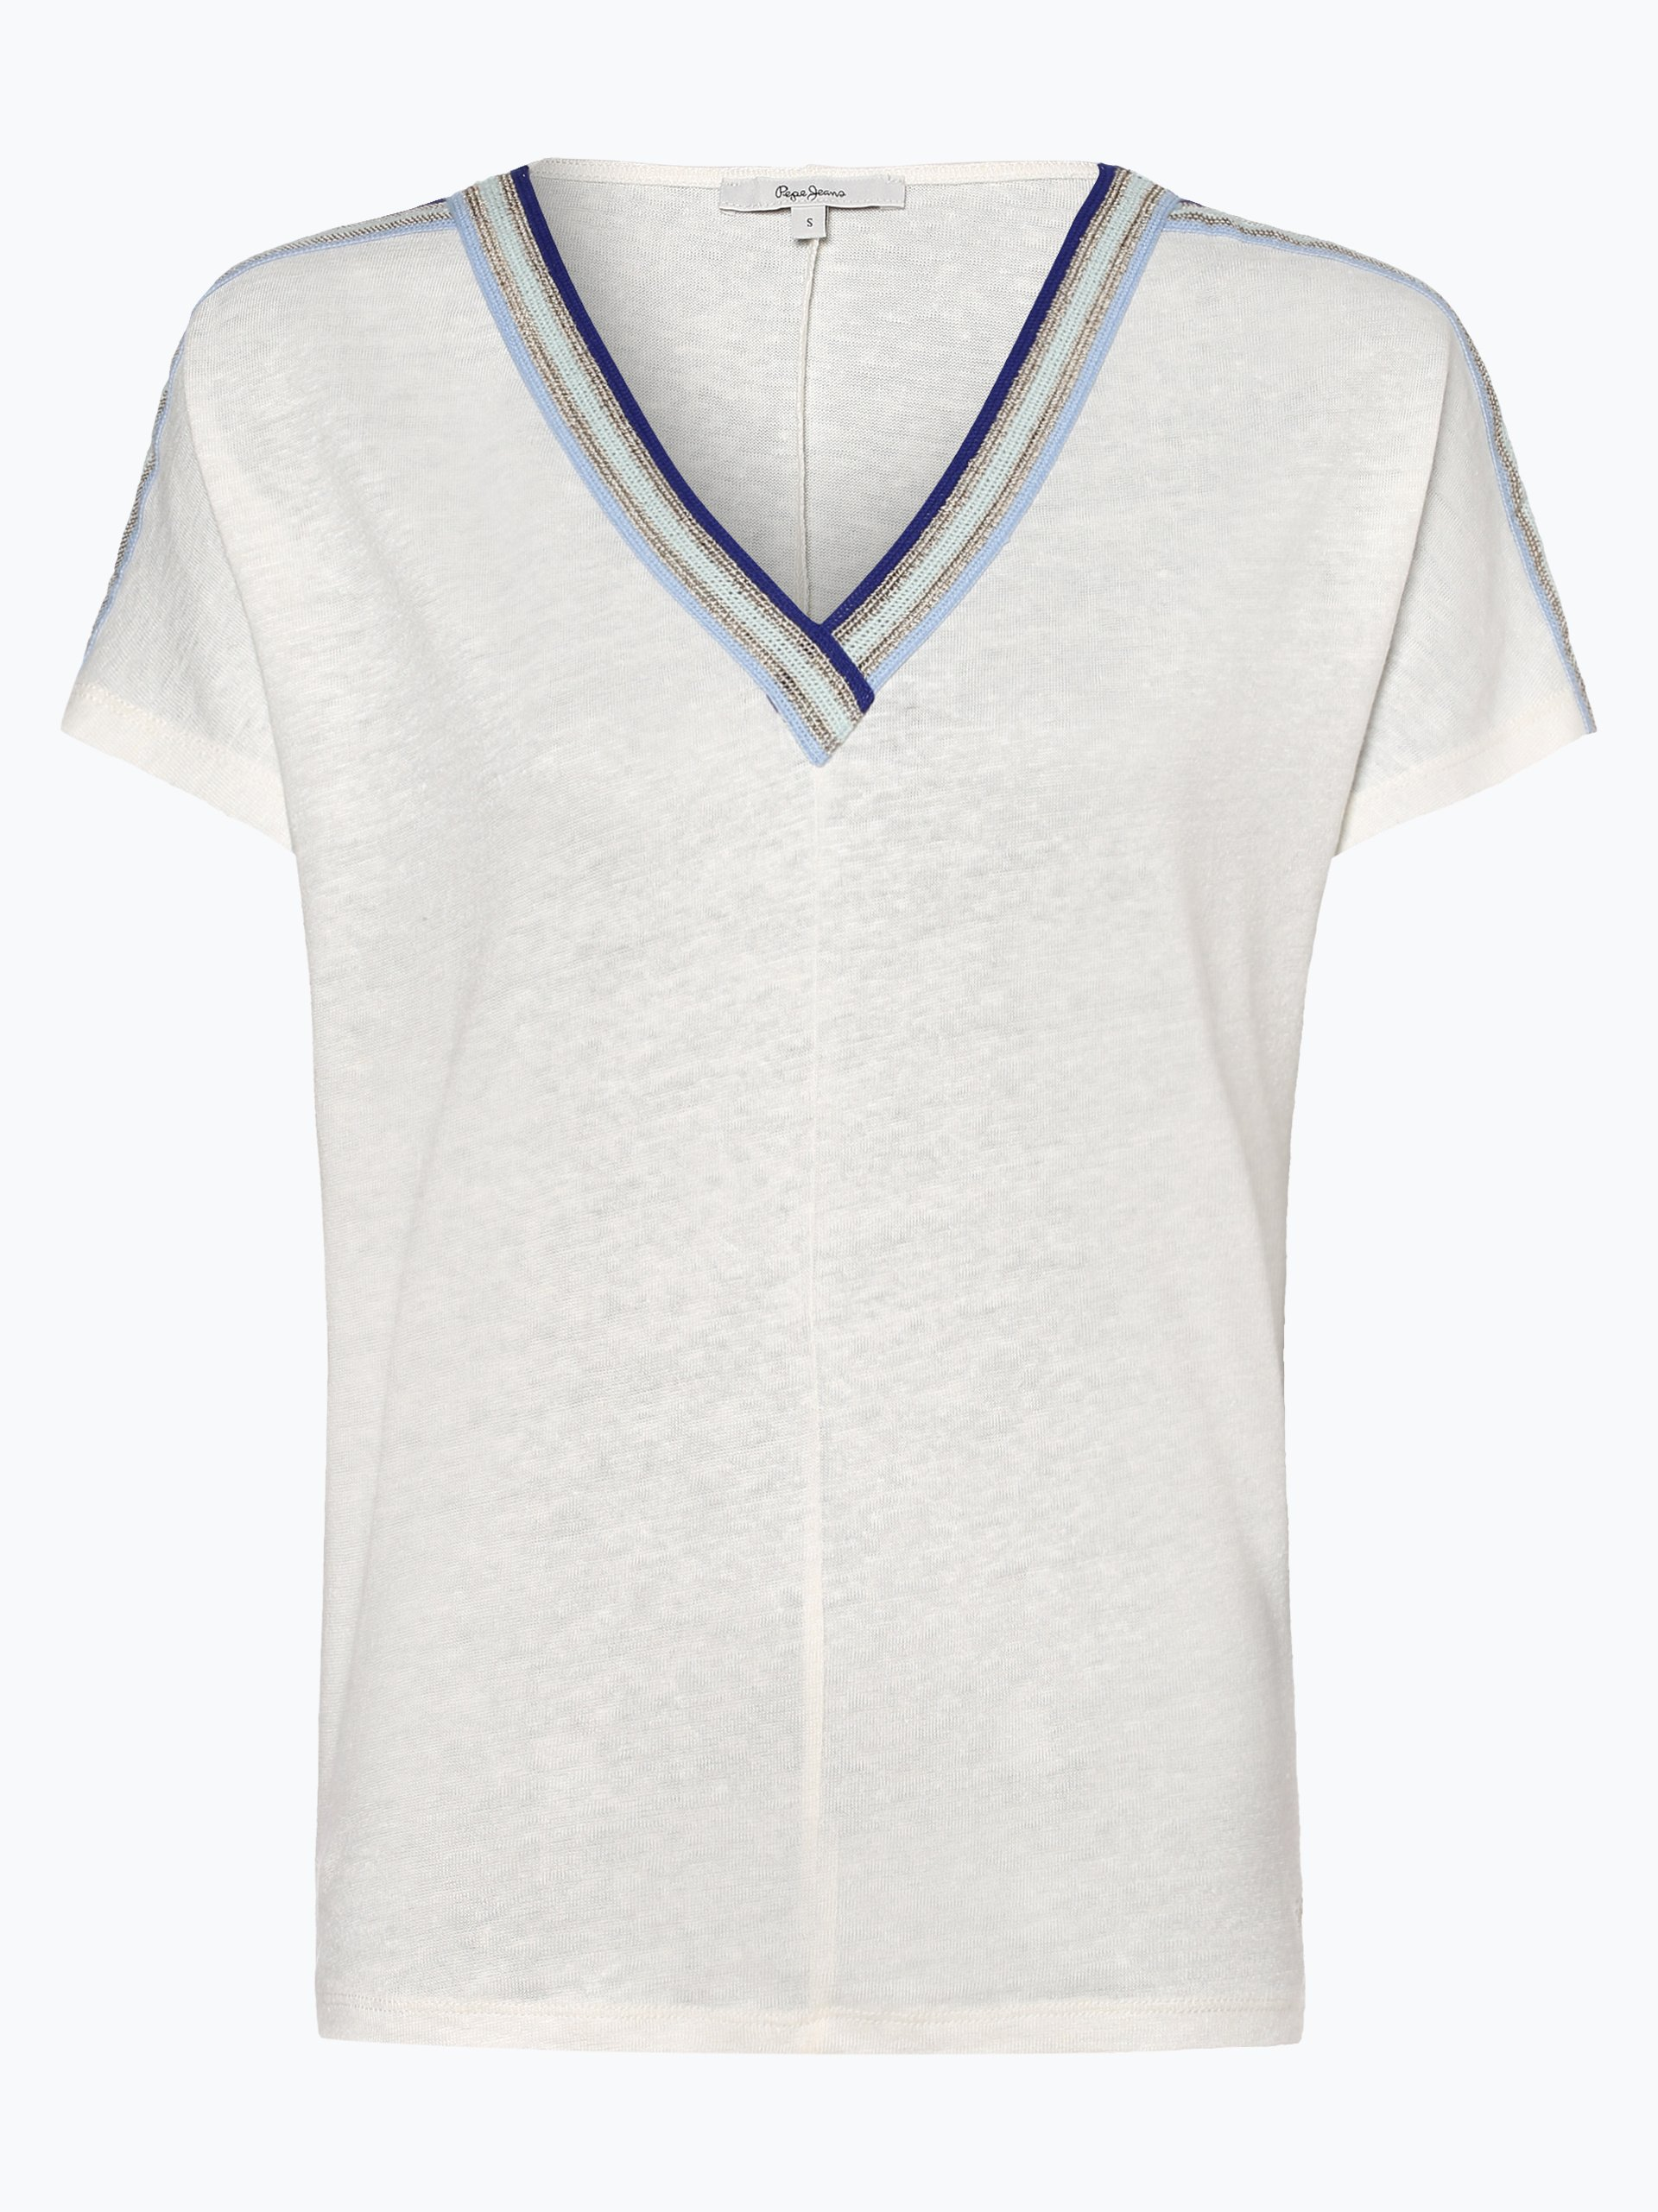 Pepe Jeans Damen T-Shirt mit Leinen-Anteil - Antonia